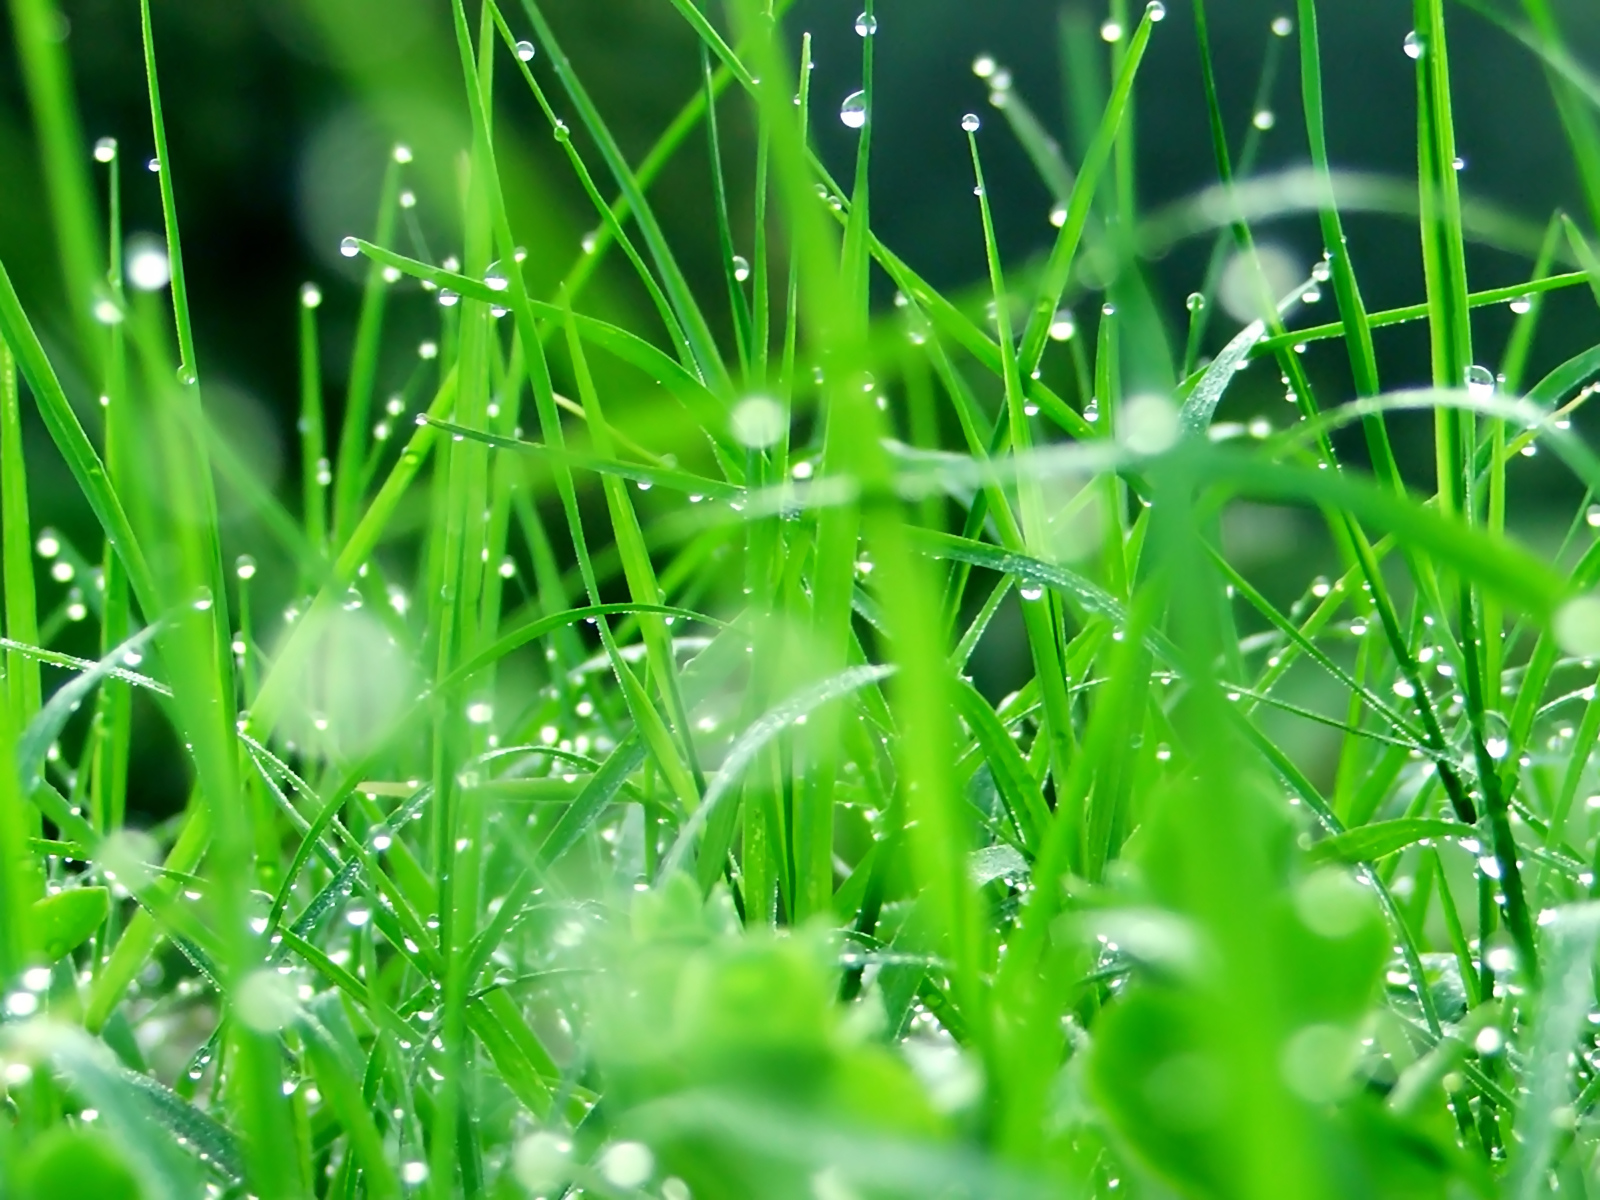 Belles photos  3686-perles-de-pluie-dans-l-herbe-WallFizz